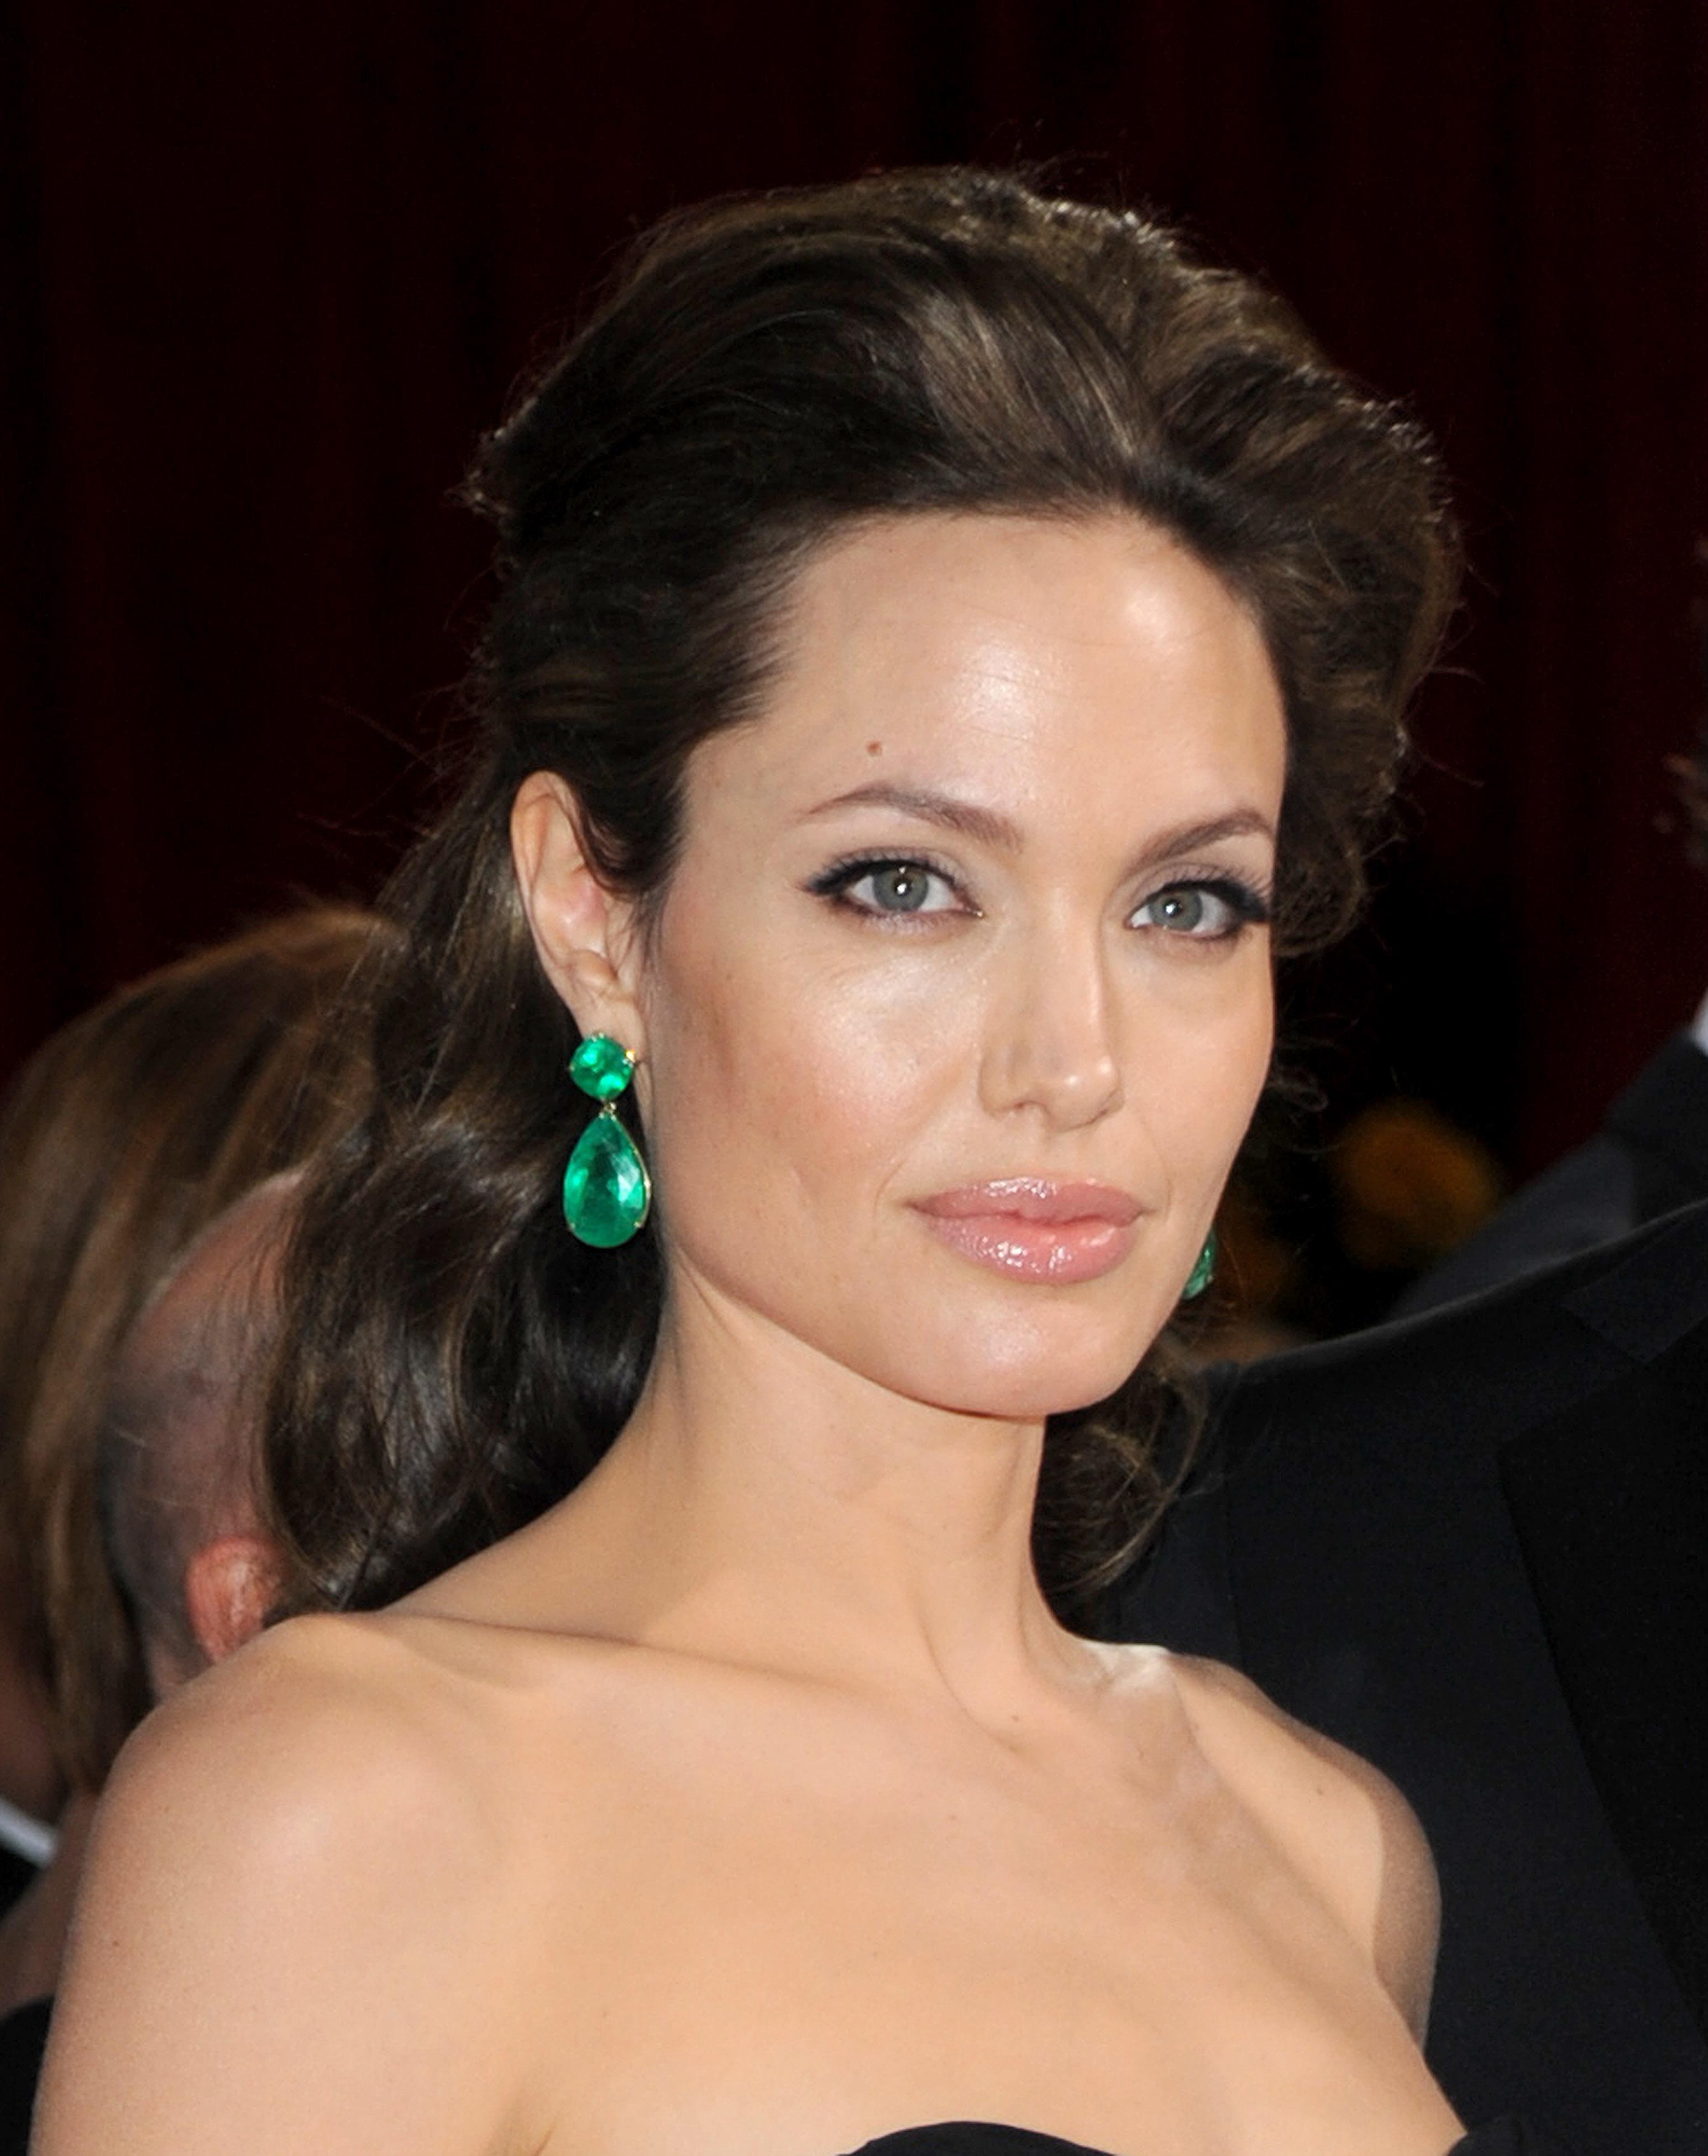 jolie_sd4220804.jpg Angelina Jolie